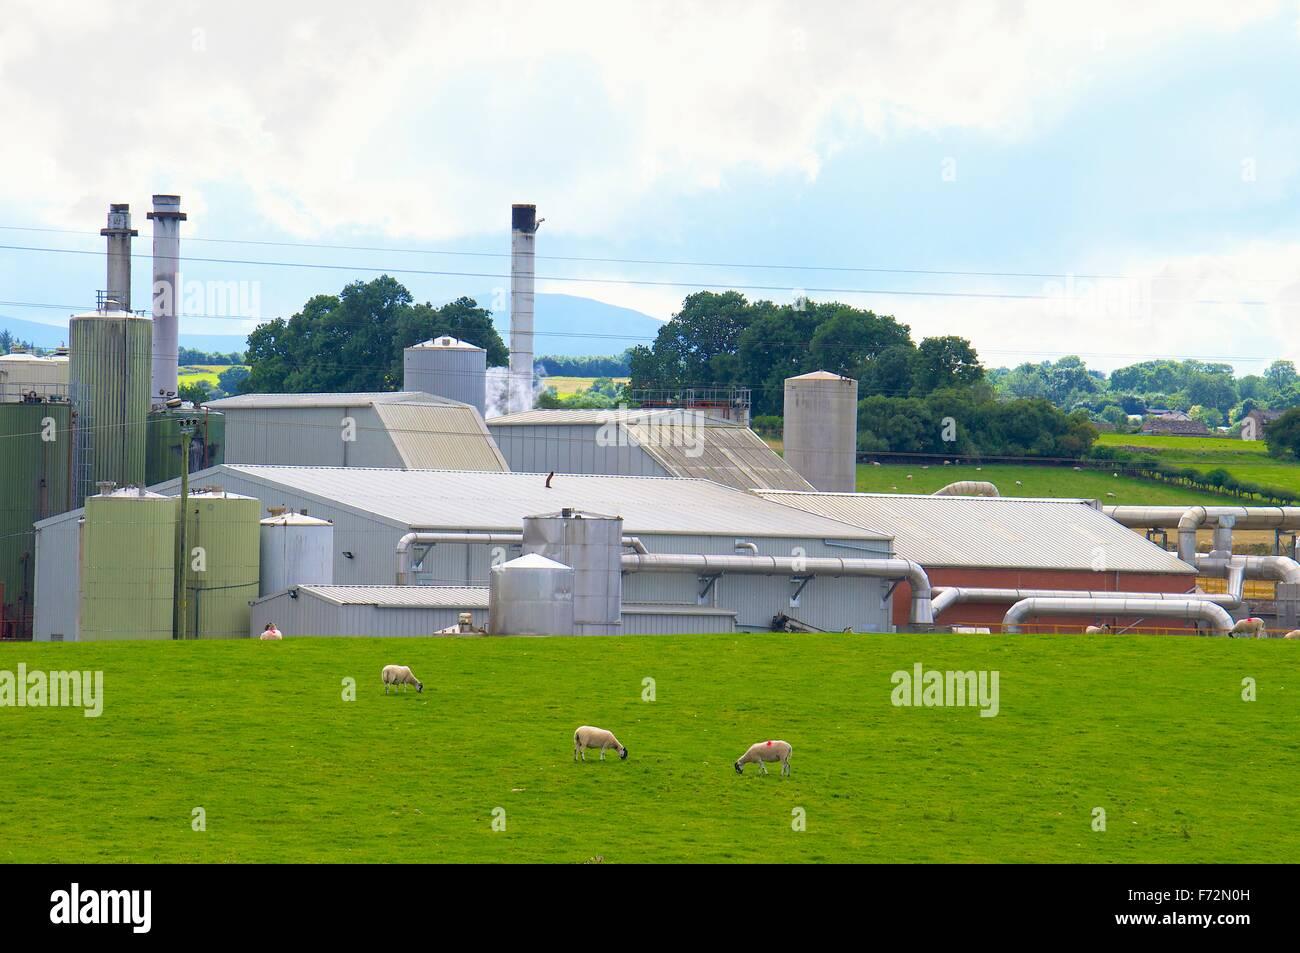 Penrith, Cumbria, England. Alba Protein Penrith Ltd animal rendering plant, source of the Penrith Pong. - Stock Image